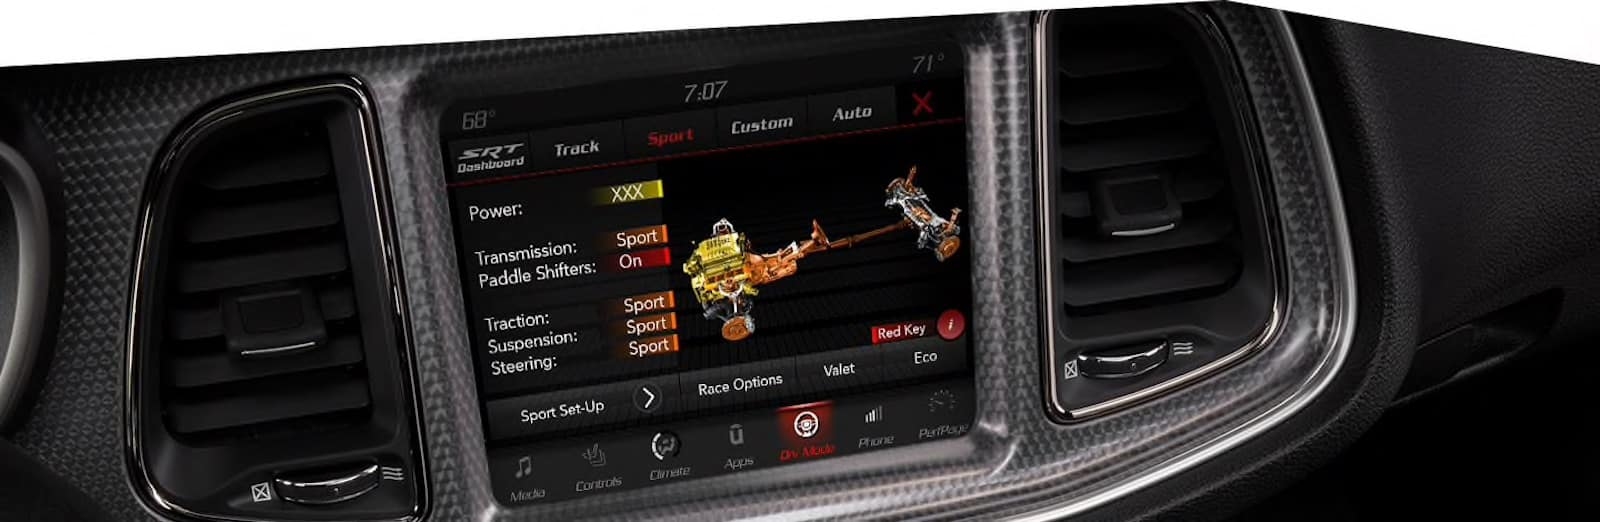 2021 Dodge Challenger SRT drive modes